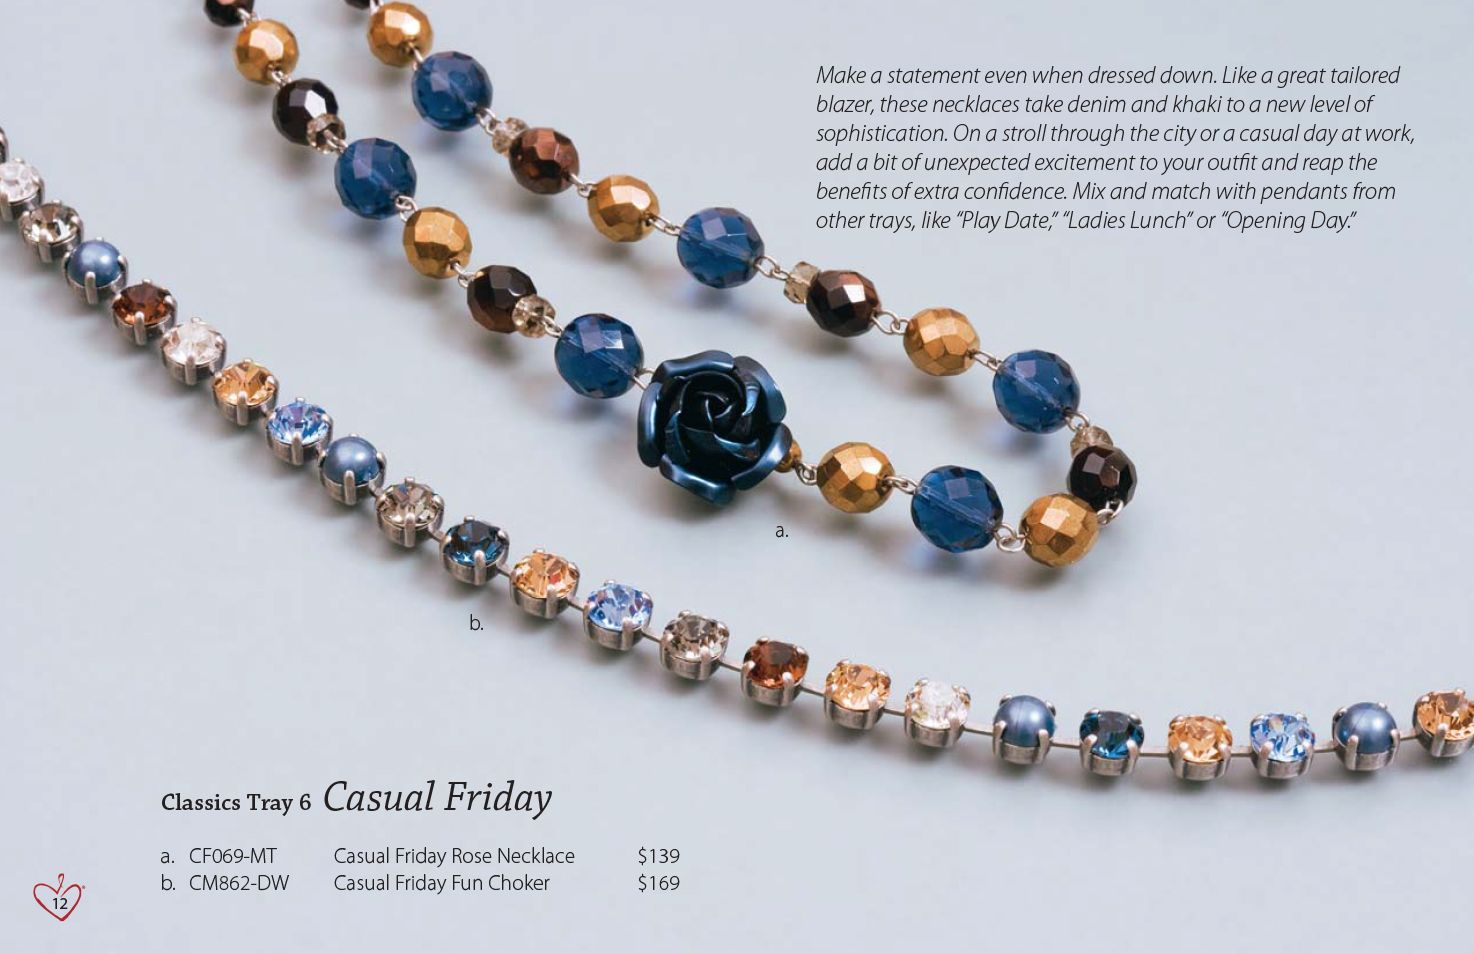 Sabika Look Necklace - Sabika classics collection tray 6 casual friday